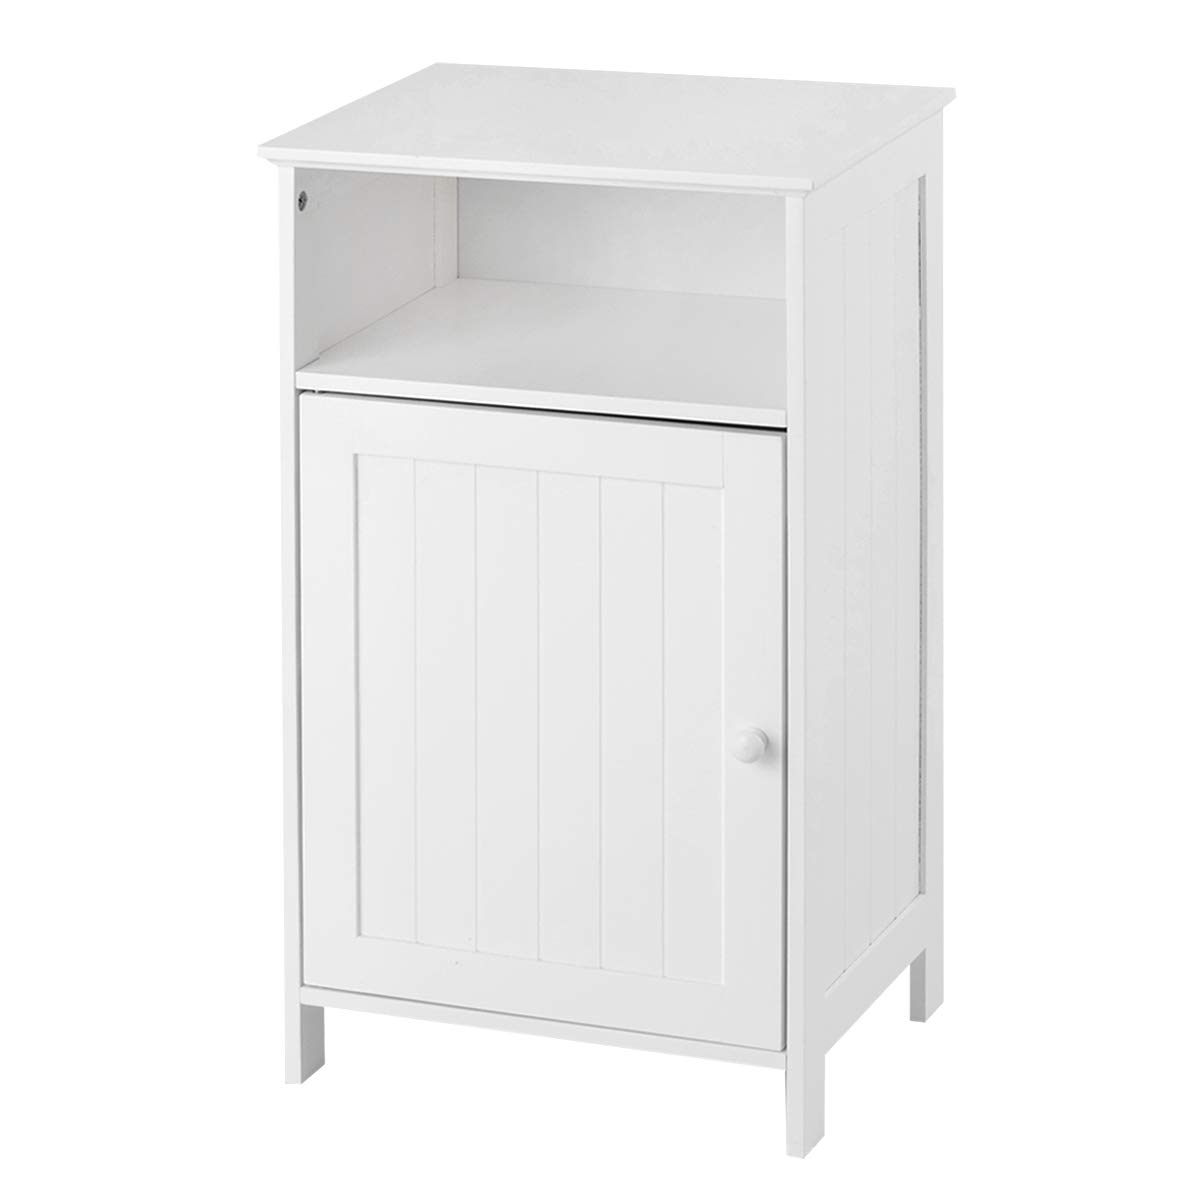 Tangkula Bathroom Floor Storage Cabinet, Home Living Room Bedroom Sturdy Wooden Modern Side Cabinet Organizer, Storage Cabinet Furniture (27.5'' with Door)